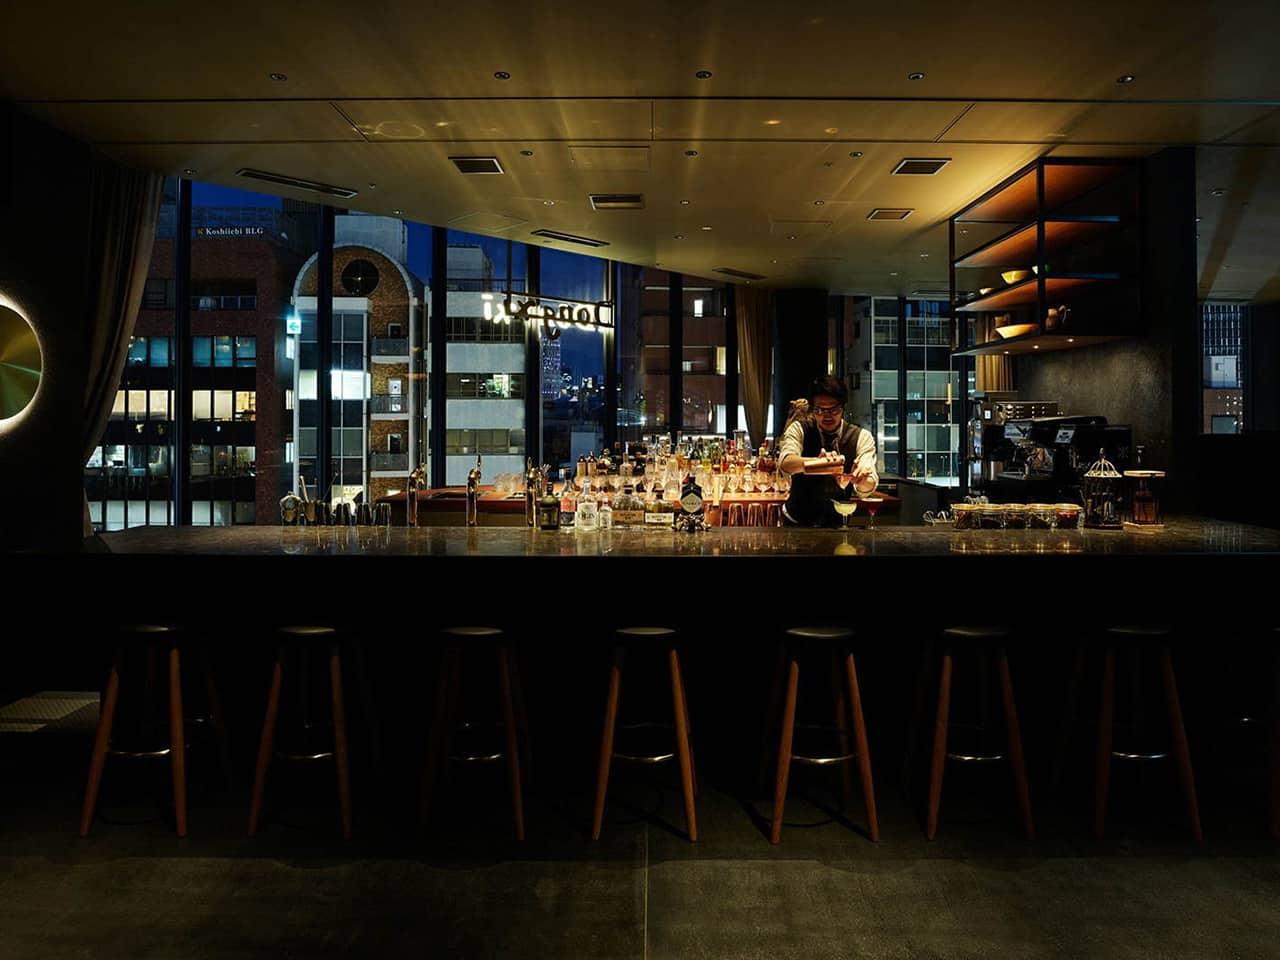 SOAK (ソーク) ร้านอาหารและบาร์สุดหรูภายในโรงแรม sequence MIYASHITA PARK